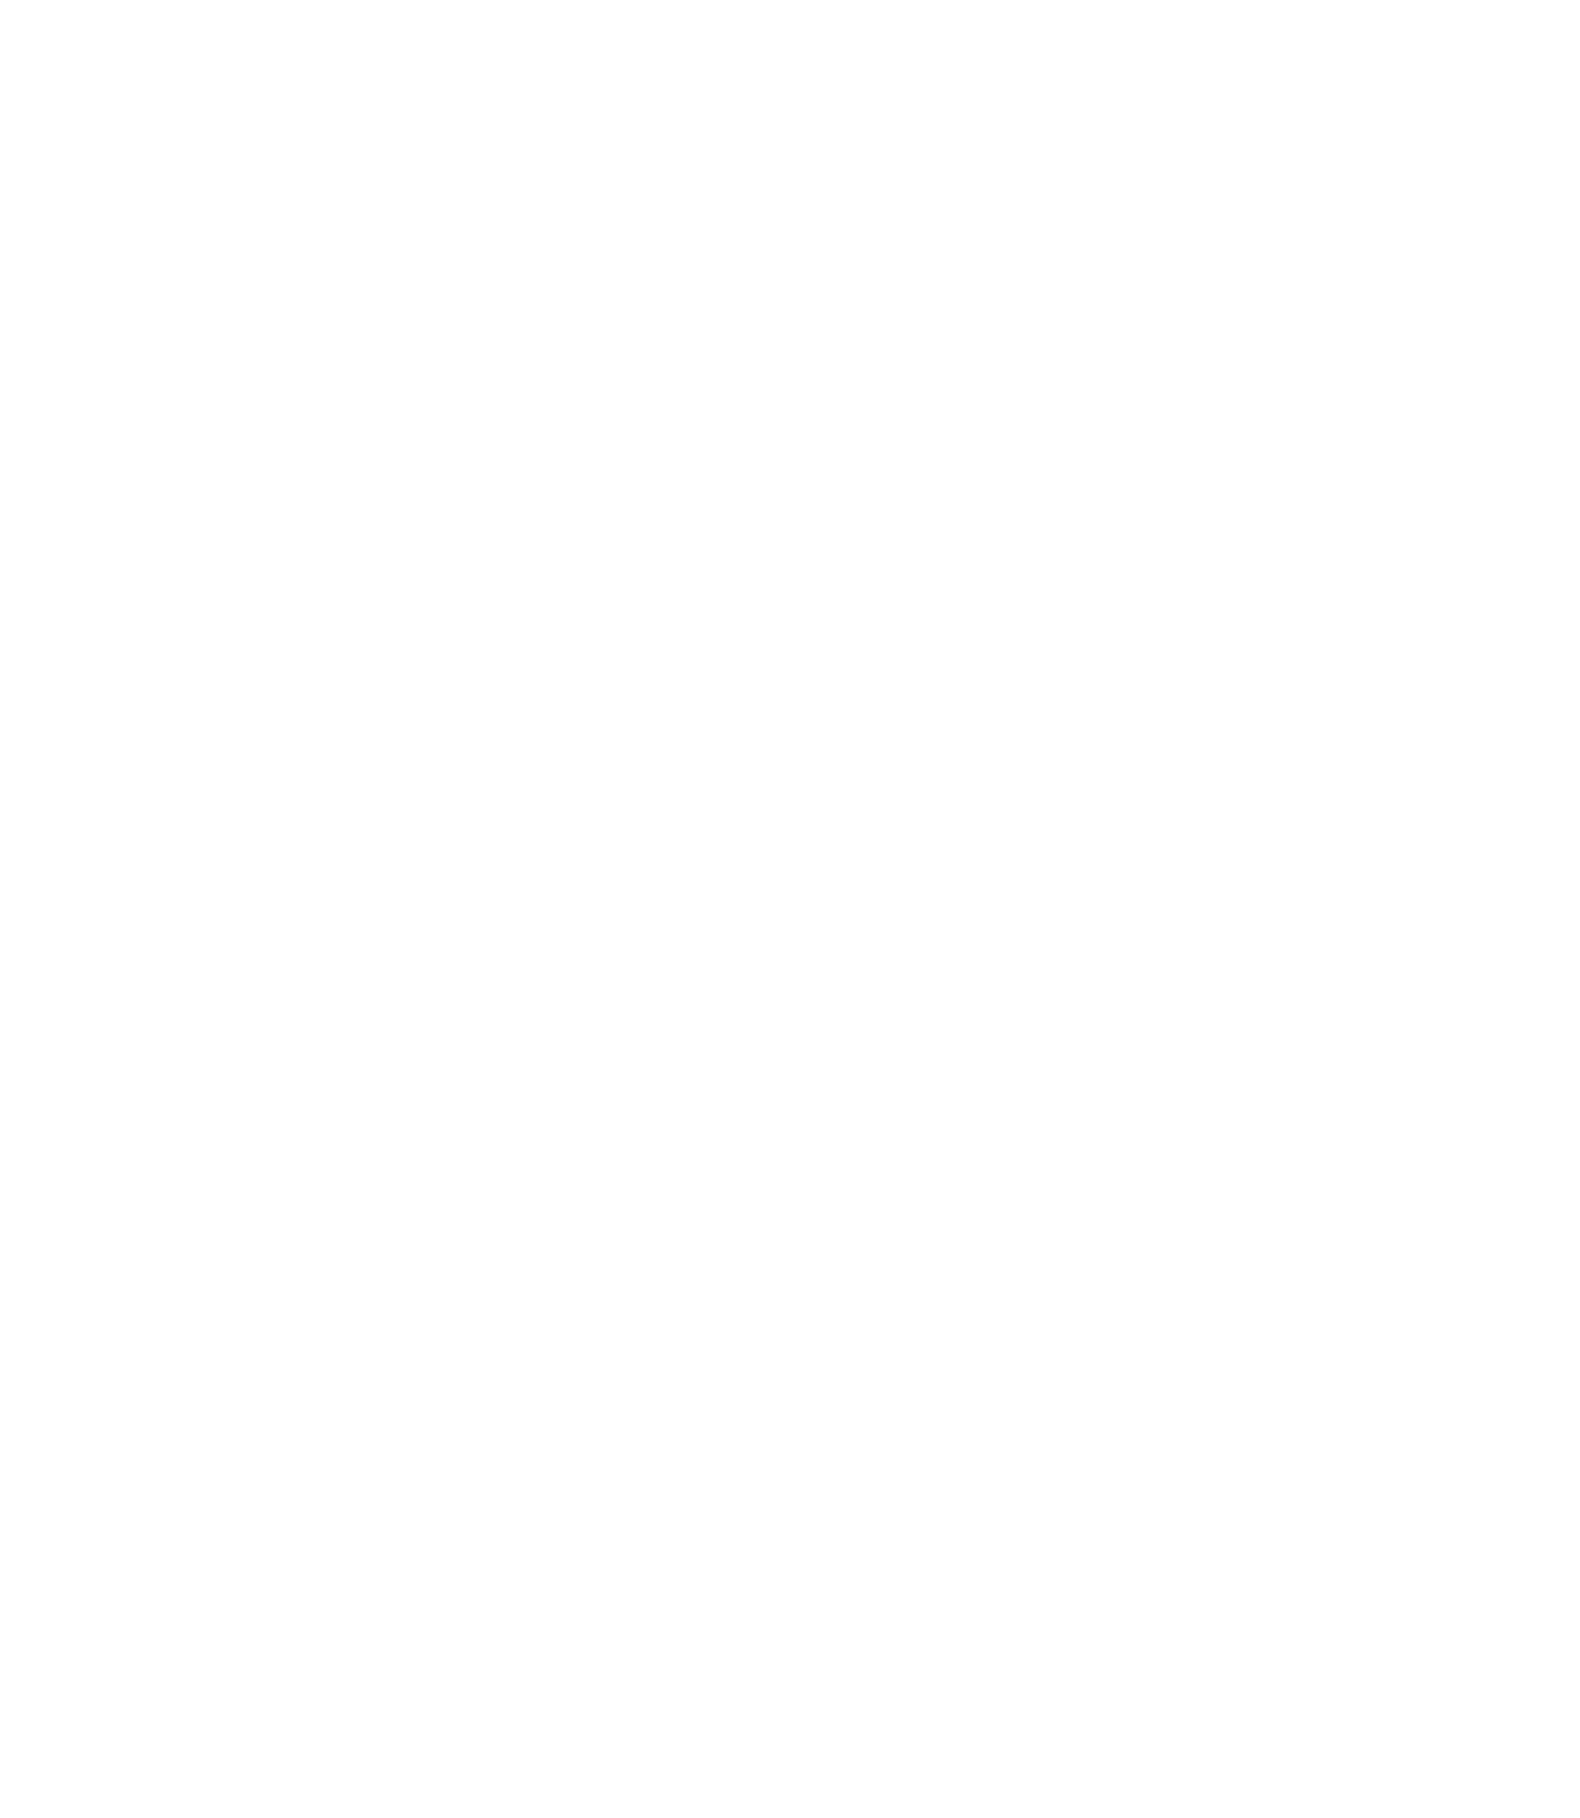 Studio Perle Noire Tattoo